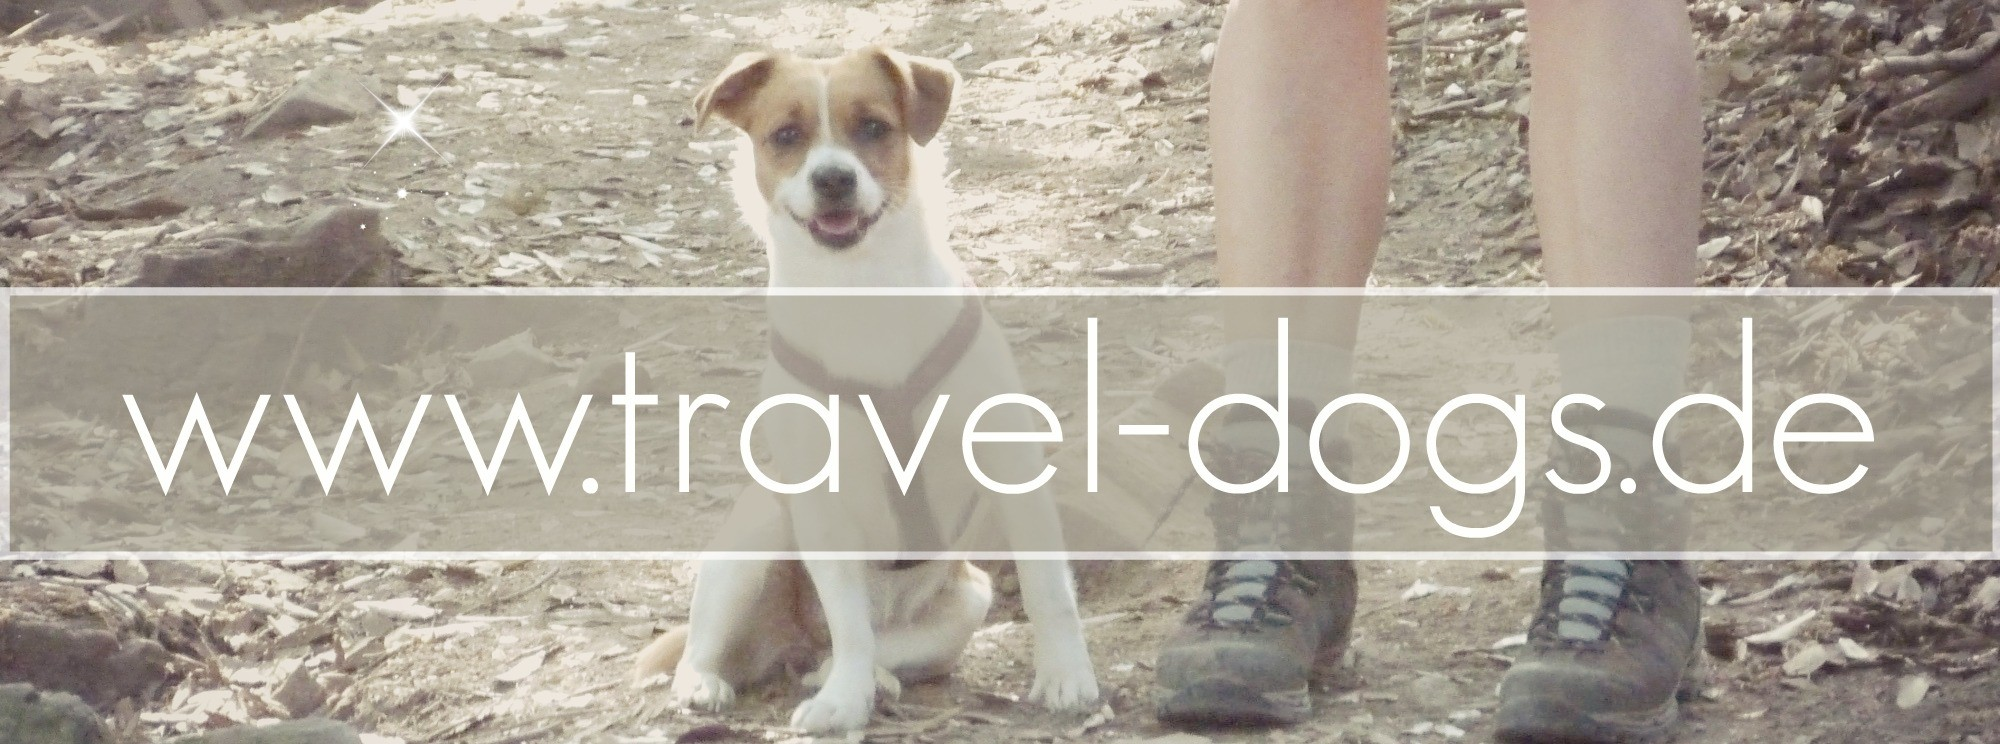 travel-dogs.de